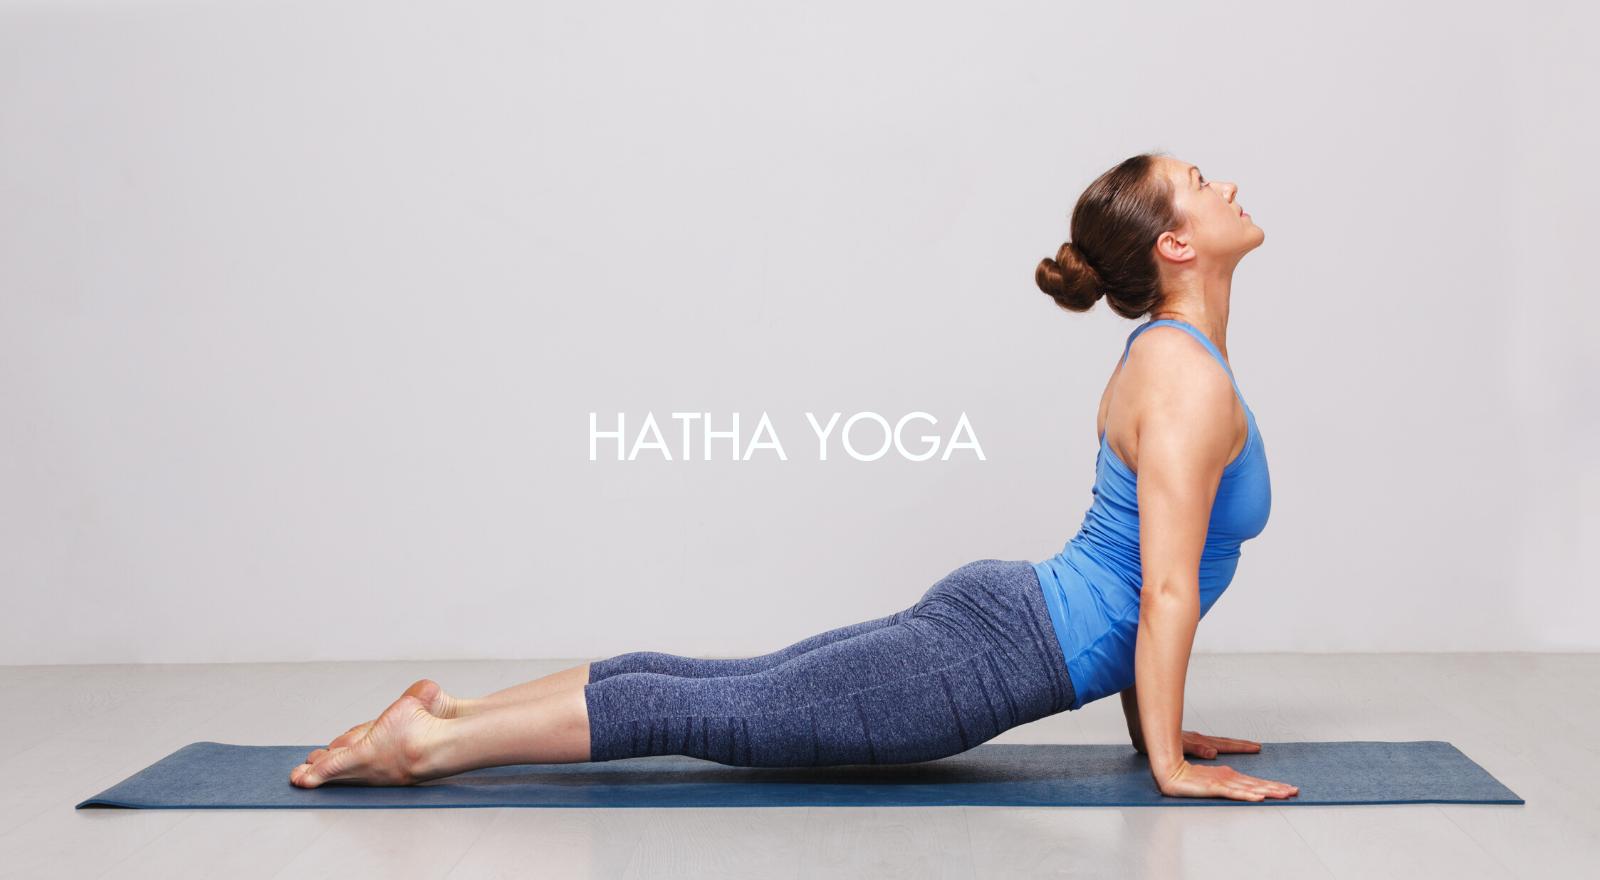 hatha yoga, yoga, hatha classes, yoga classes, exeter golf and country club, exeter yoga classes, exeter yoga studio